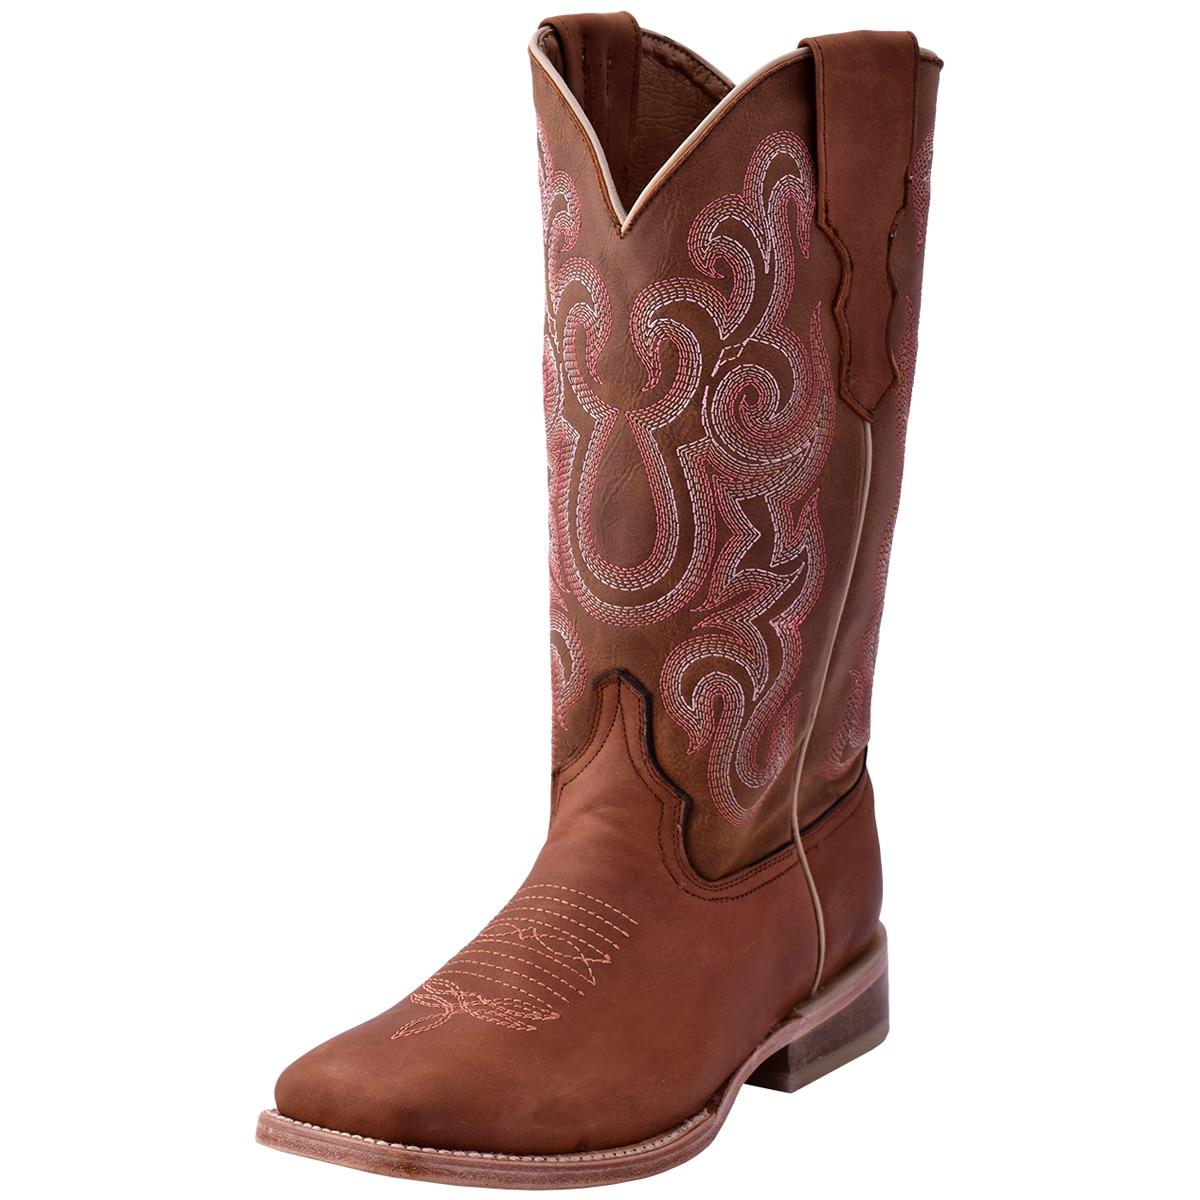 Ferrini Women's Maverick Boots